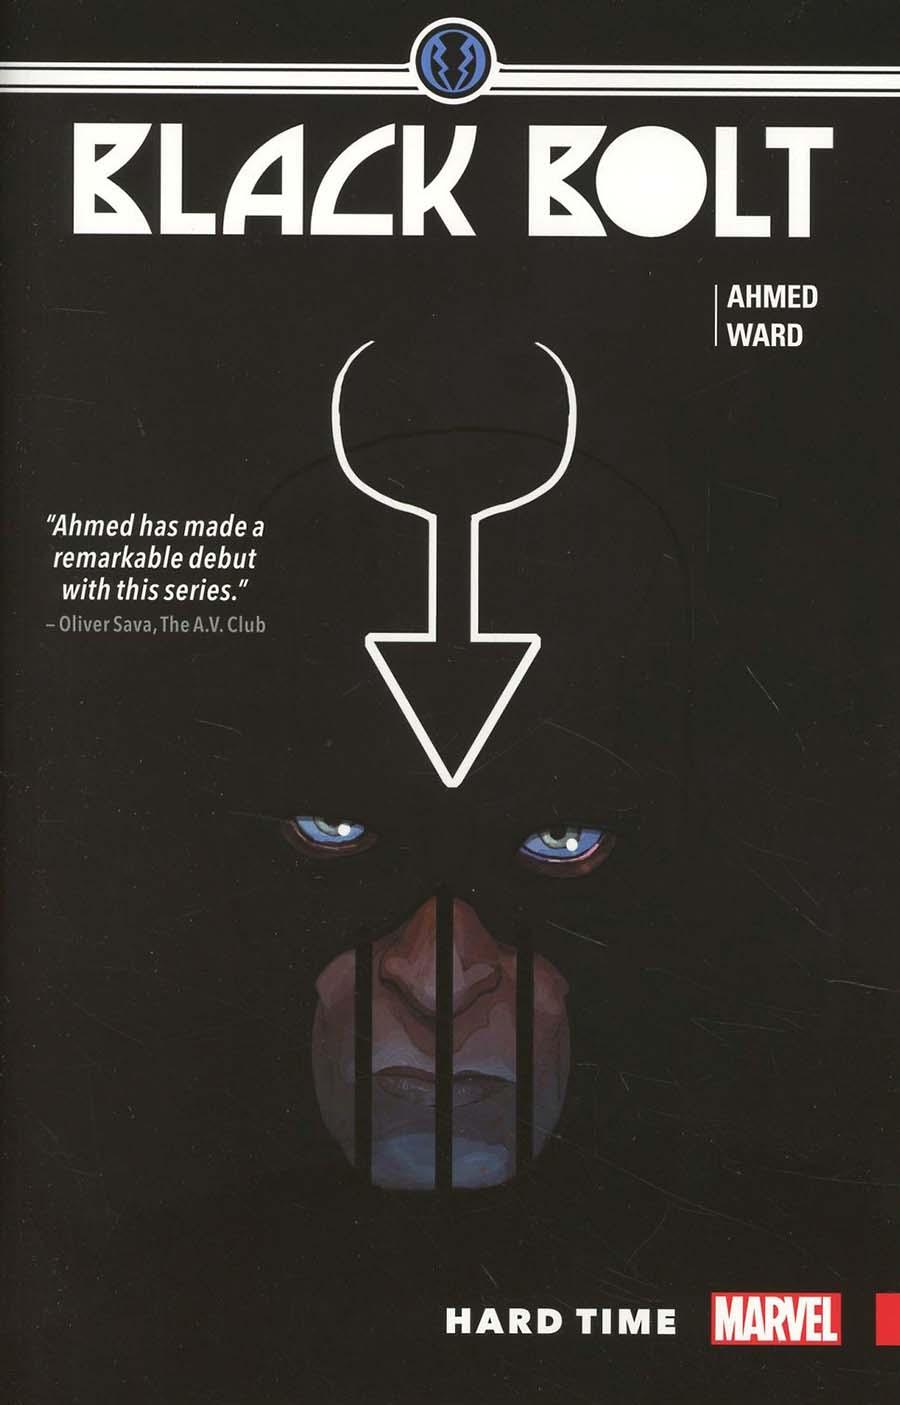 Black Bolt Vol 1 Hard Time TP